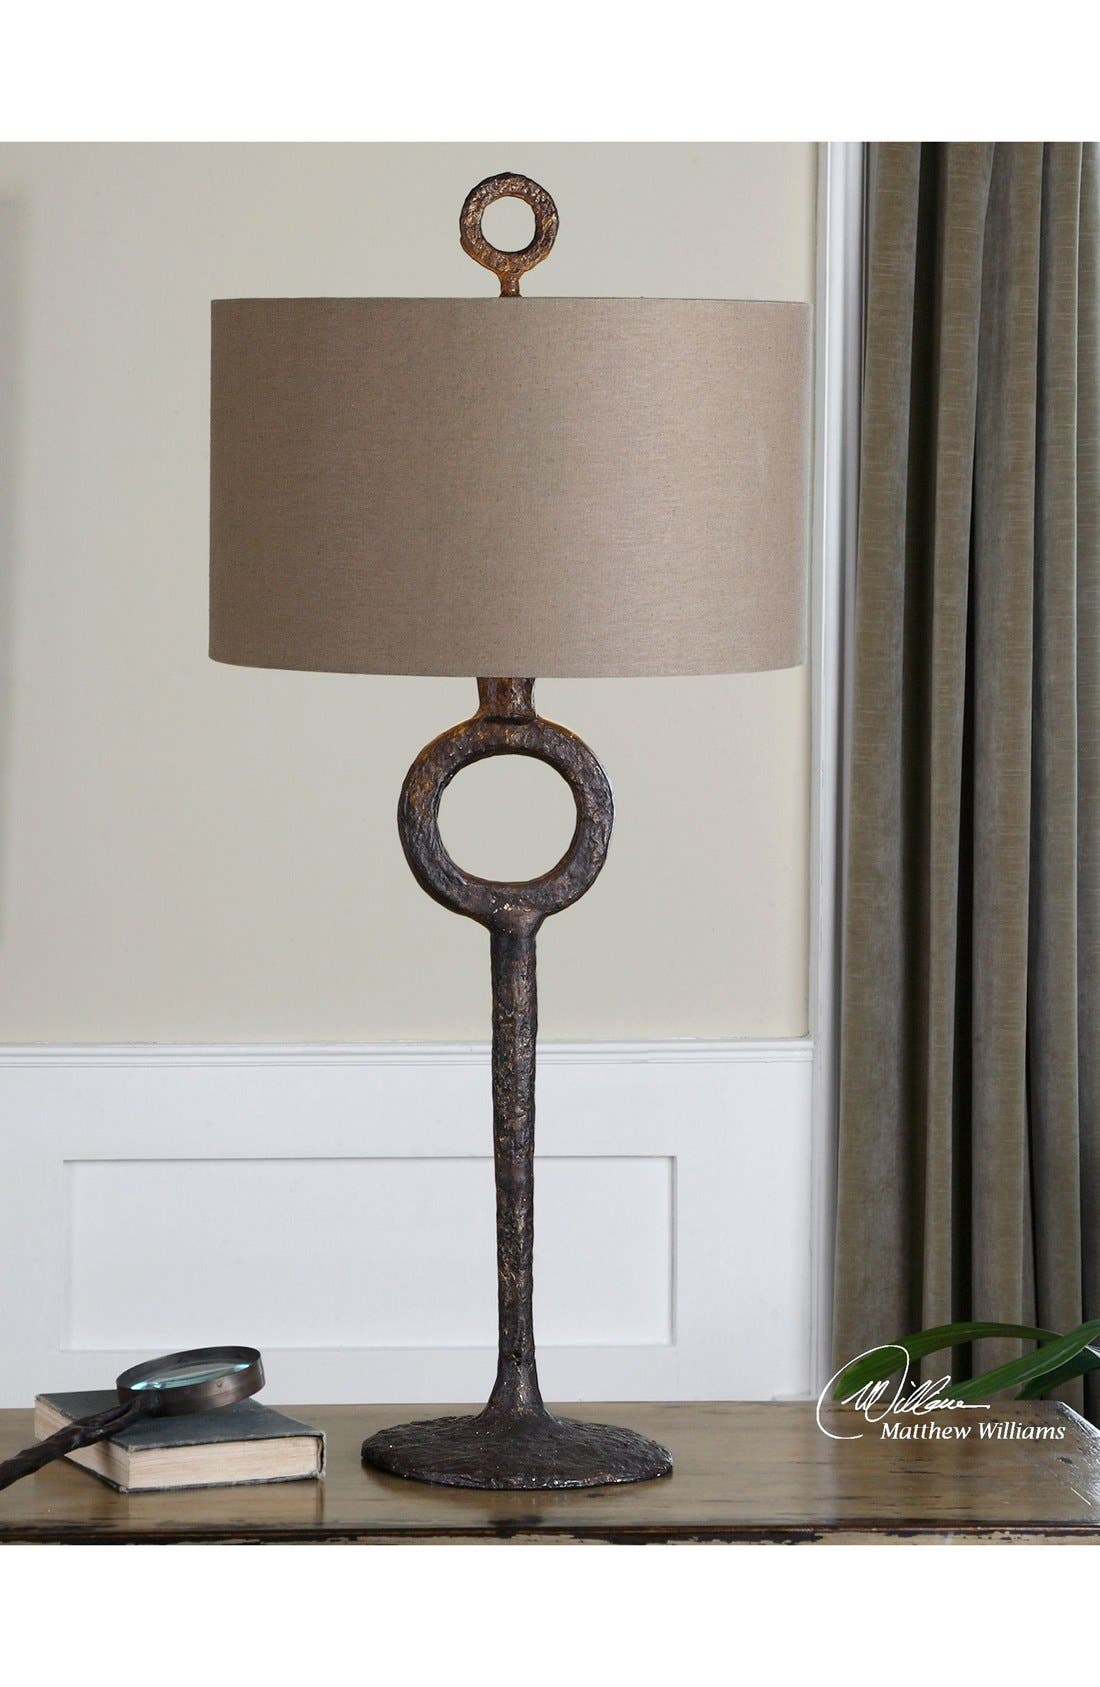 'Ferro' Cast Iron Table Lamp,                             Alternate thumbnail 2, color,                             200